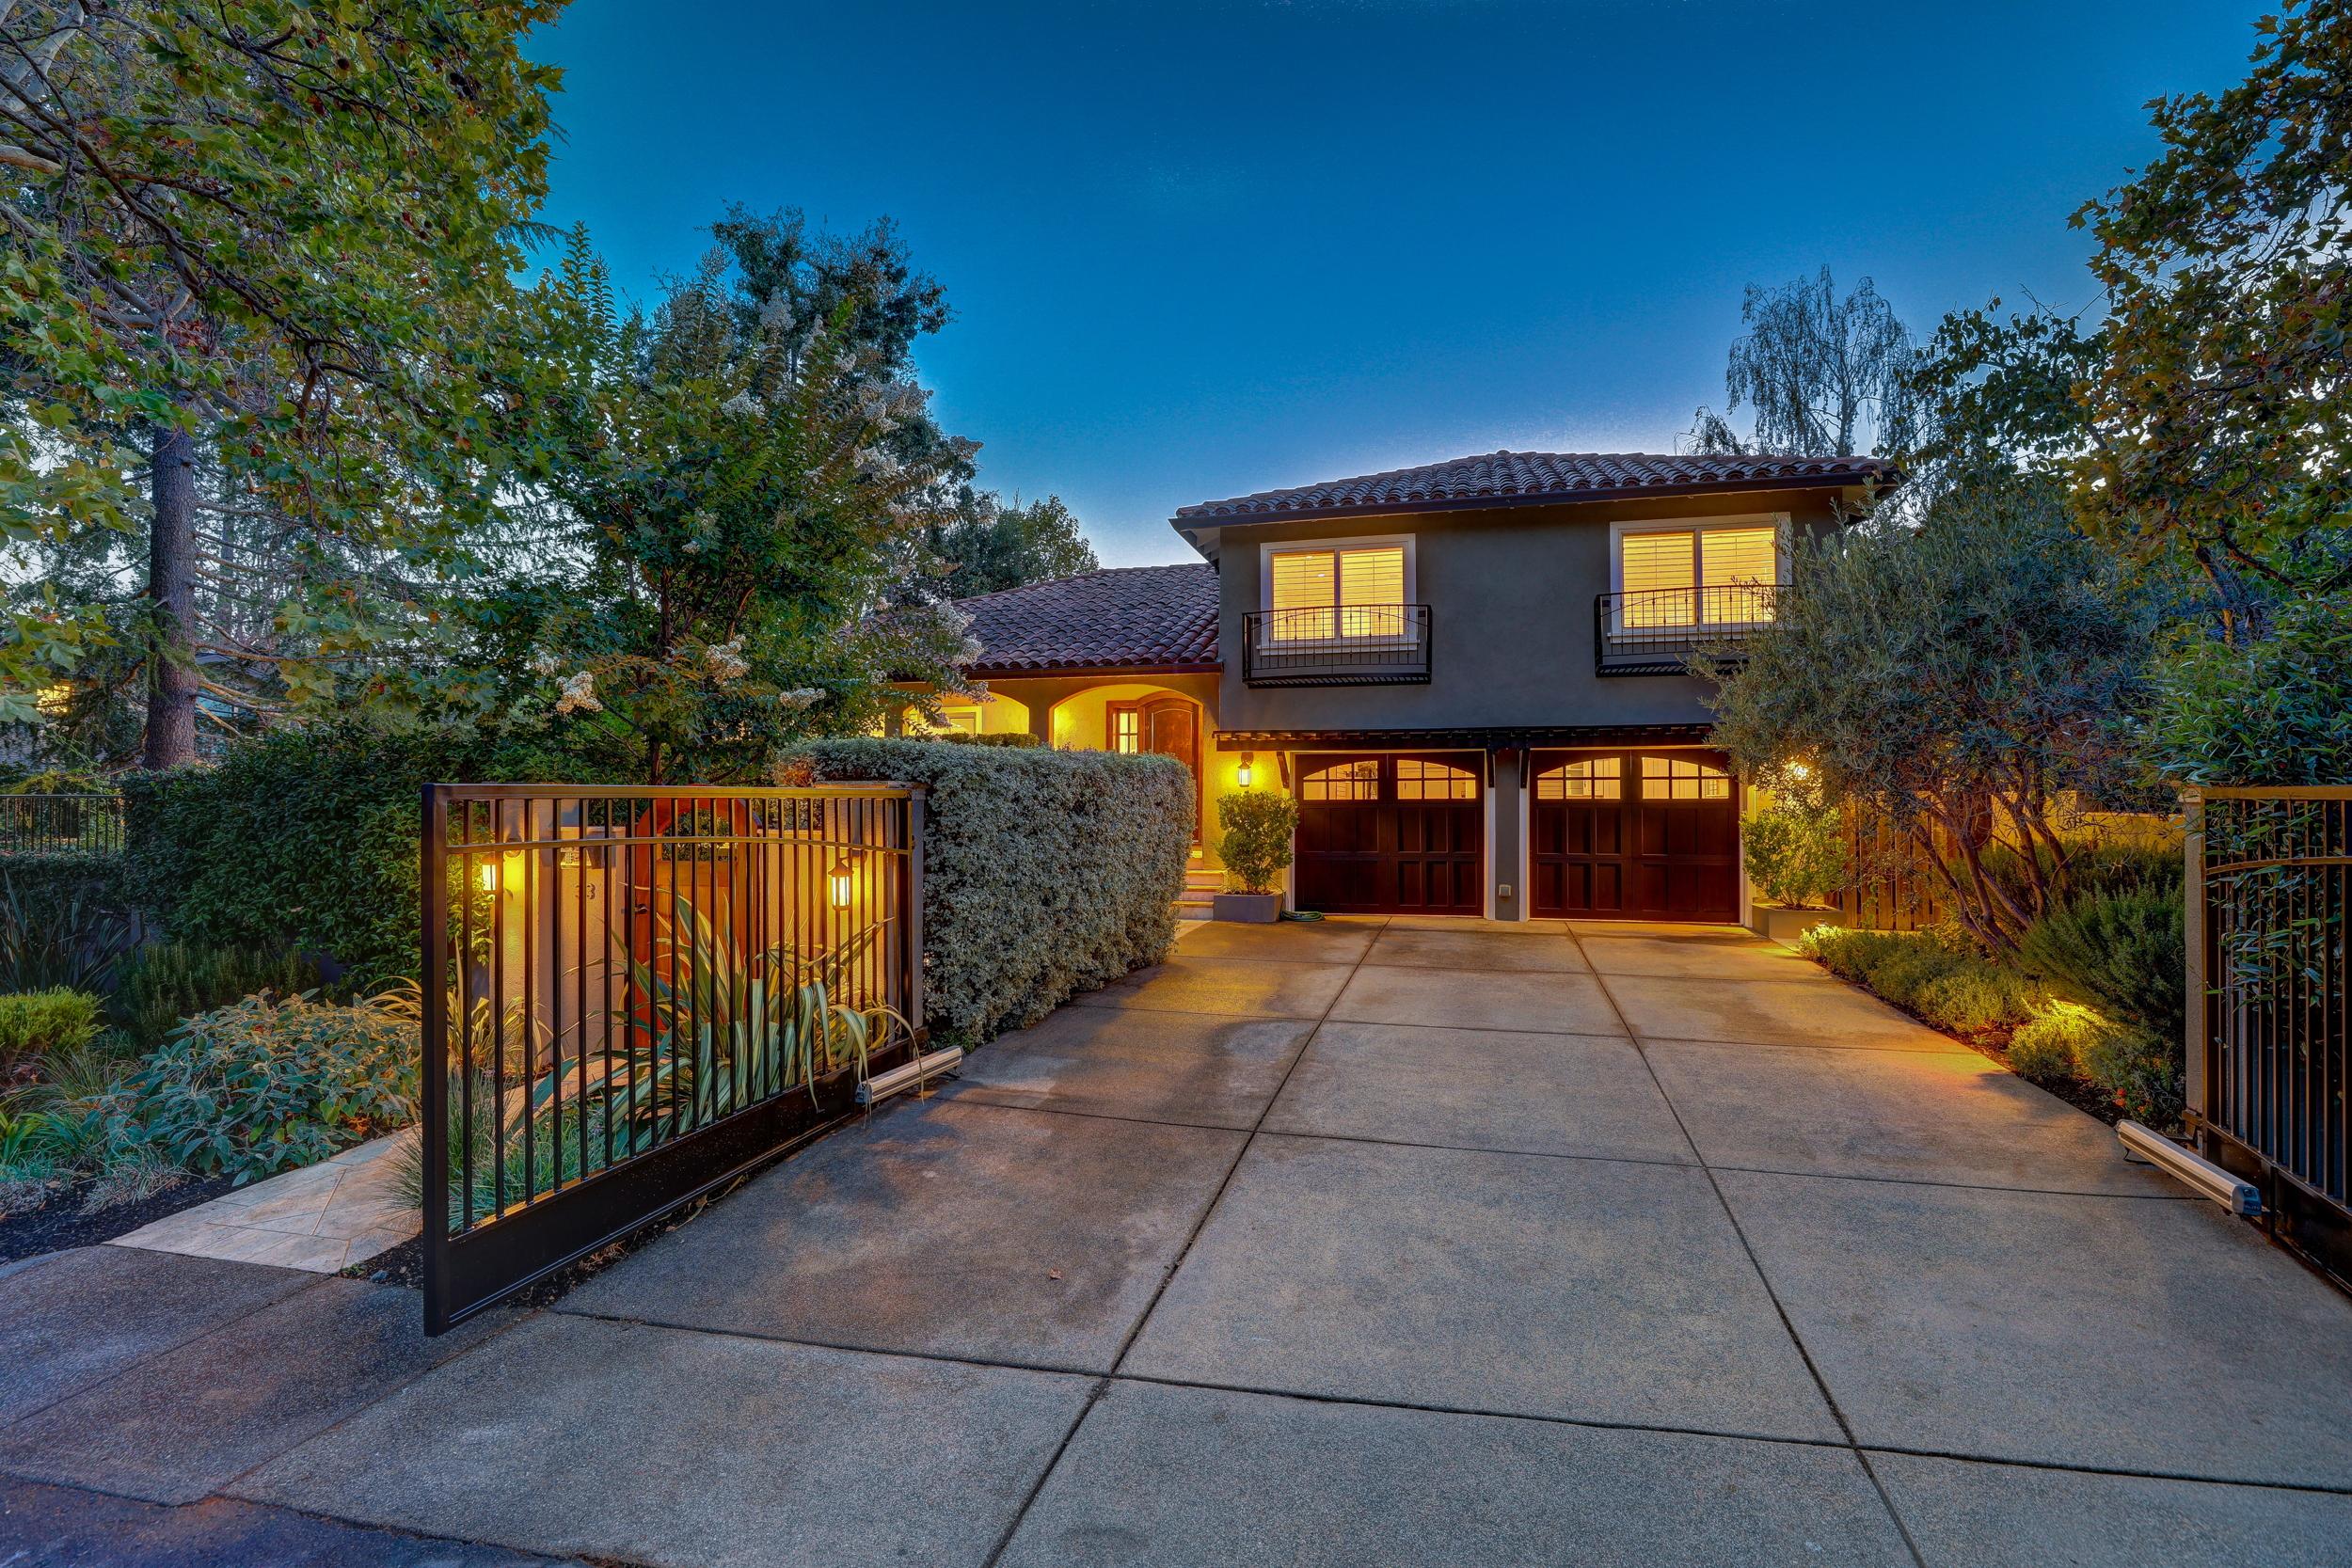 33 Laurel Grove, Kentfield Realtor03 - Own Marin with Compass - Marin County Realtor.jpg